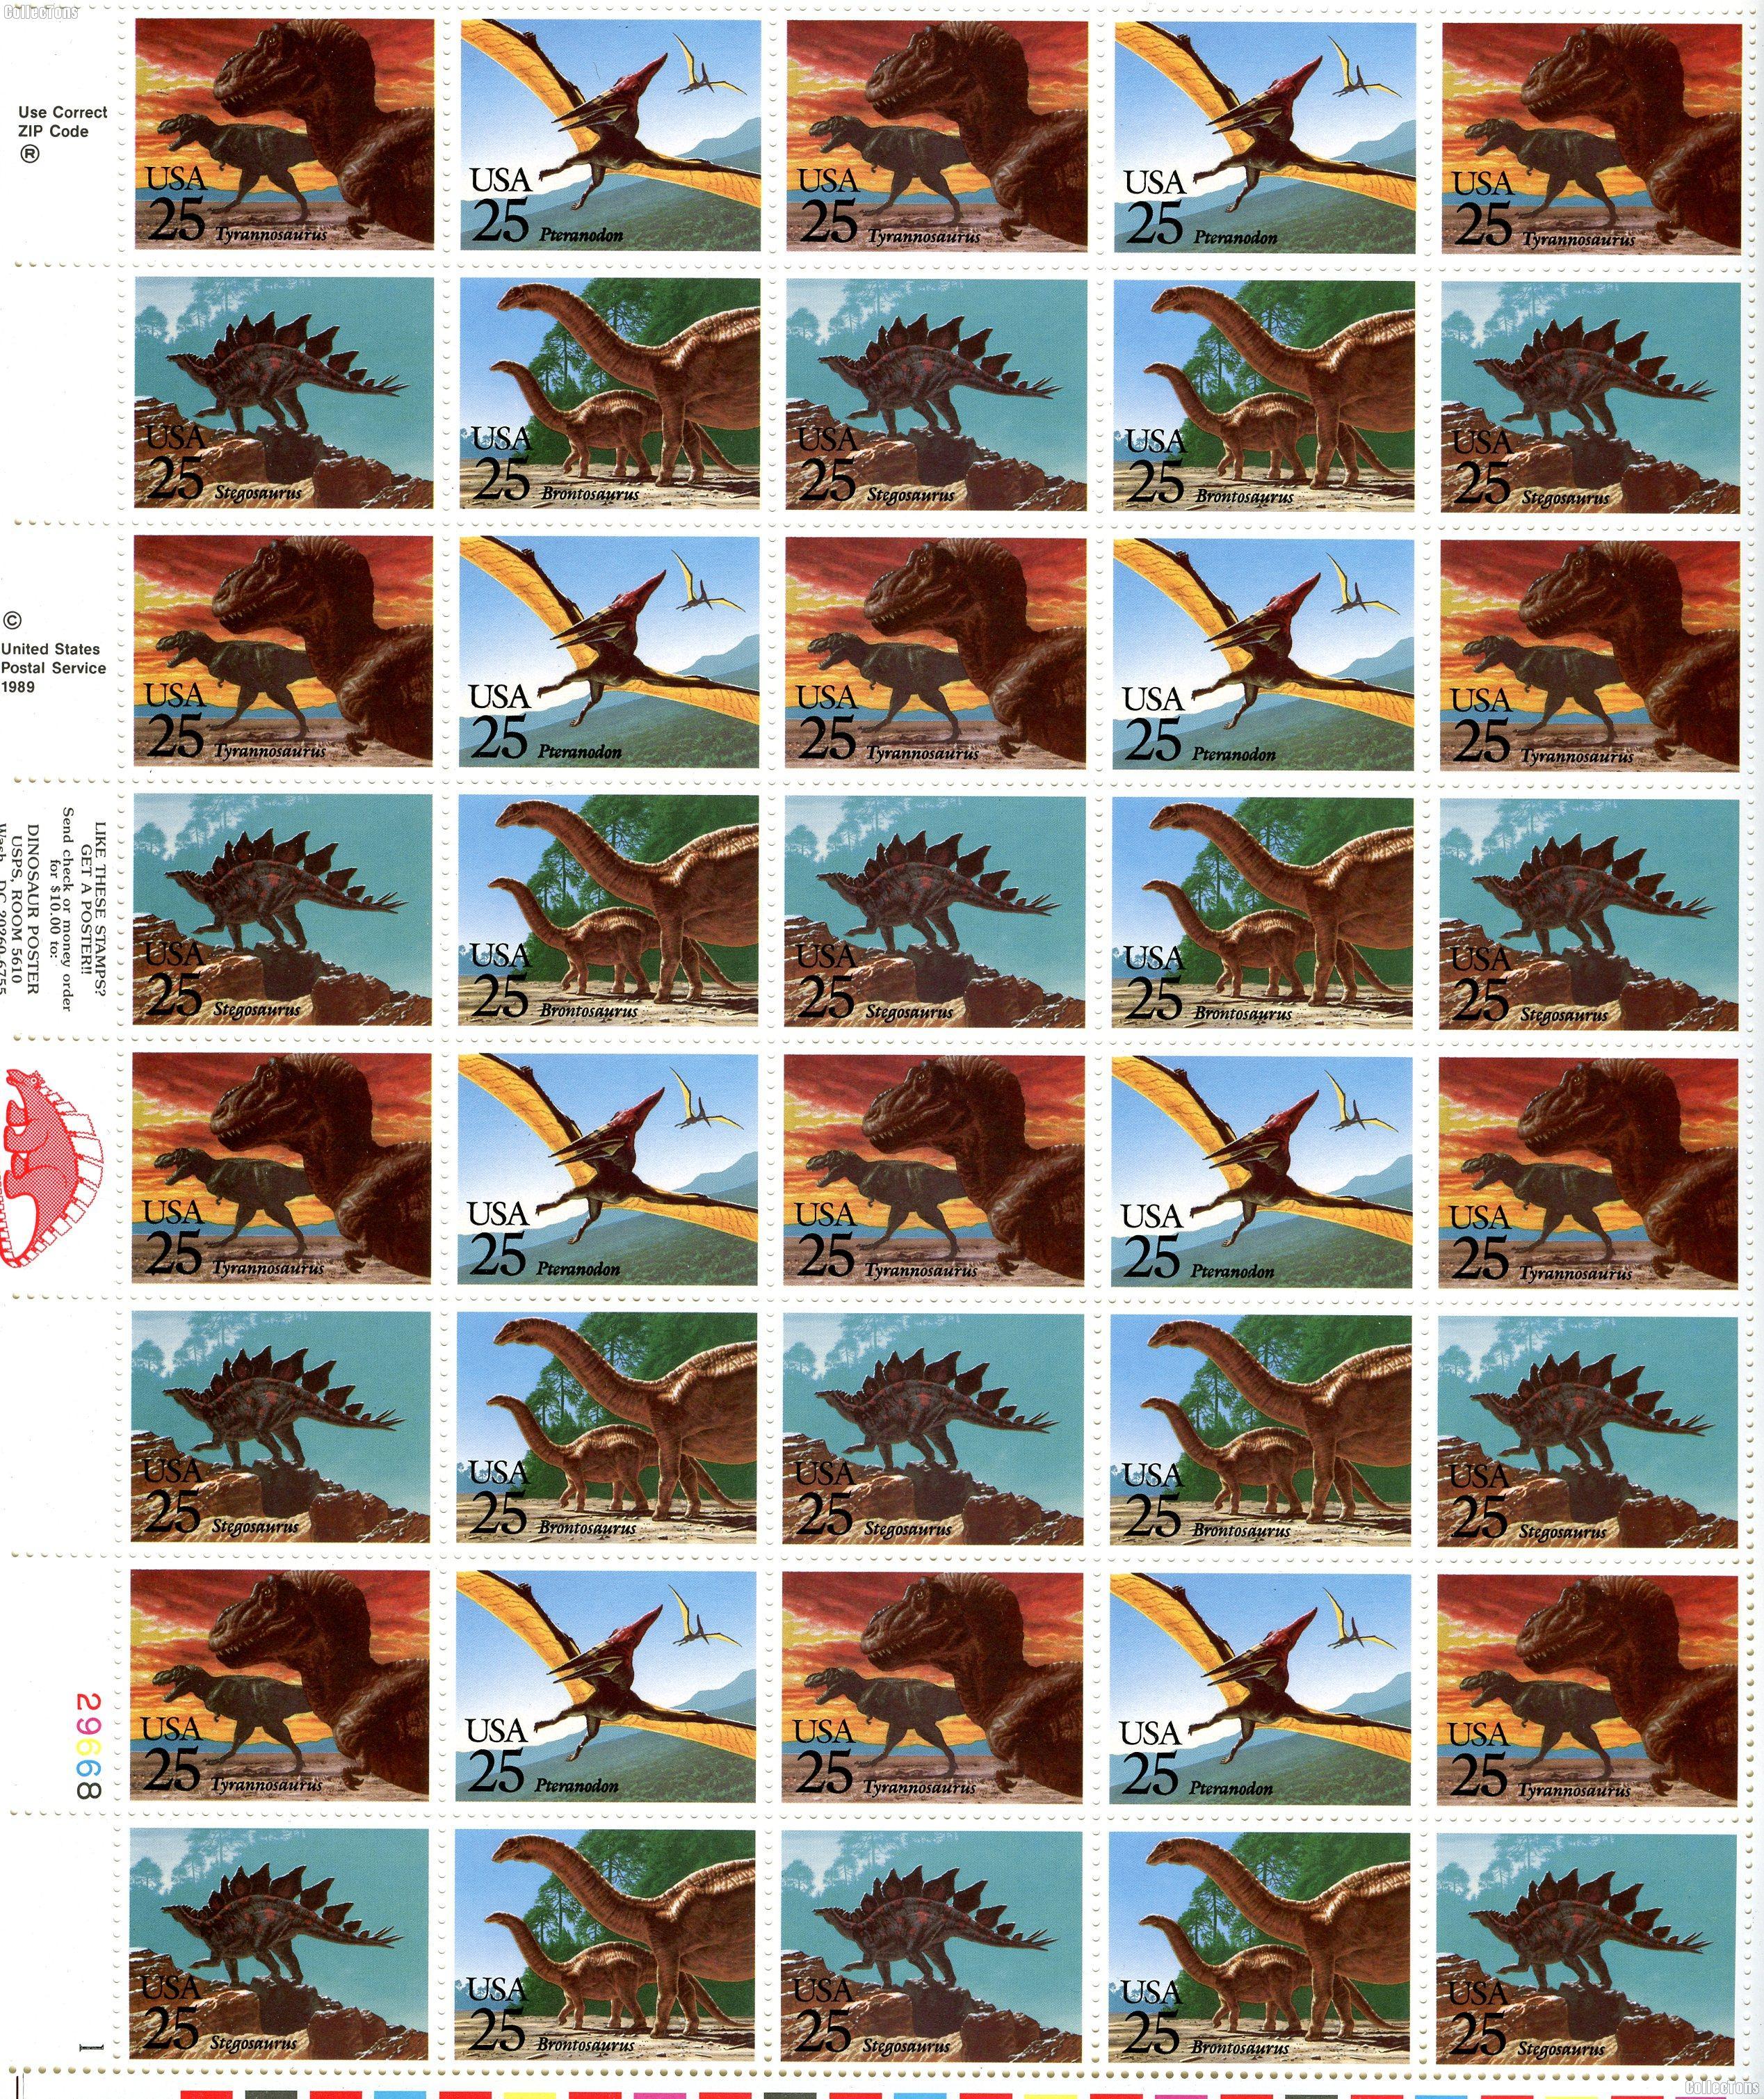 1989 Prehistoric Animals US Postage Stamp MNH Sheet of 50 Scott #2422-2425